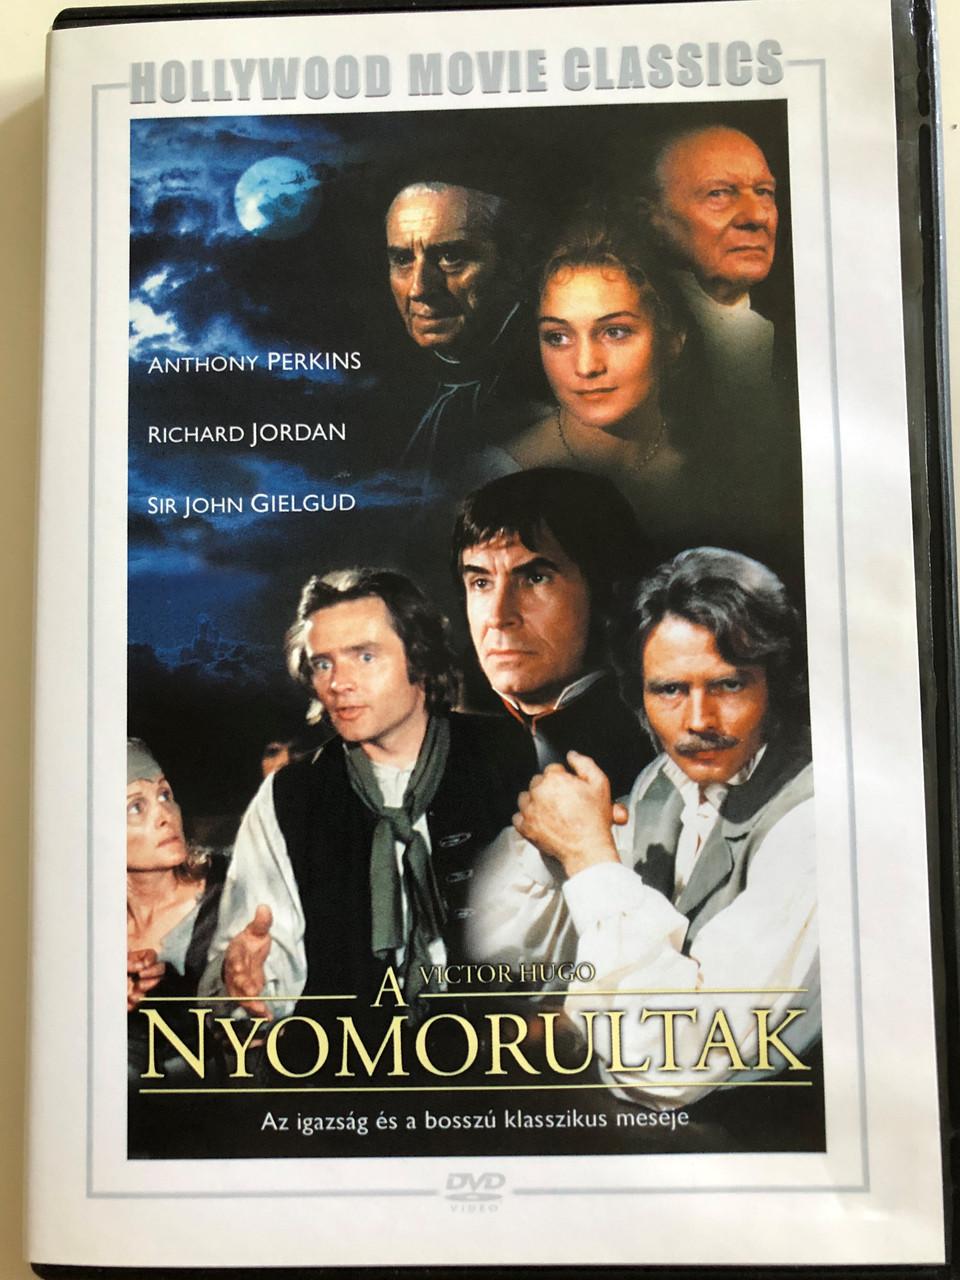 Victor Hugo's Les Misérables DVD 1978 Victor Hugo - A Nyomorultak /  Directed by Glenn Jordan / Starring: Richard Jordan, Antony Perkins, Cyrill